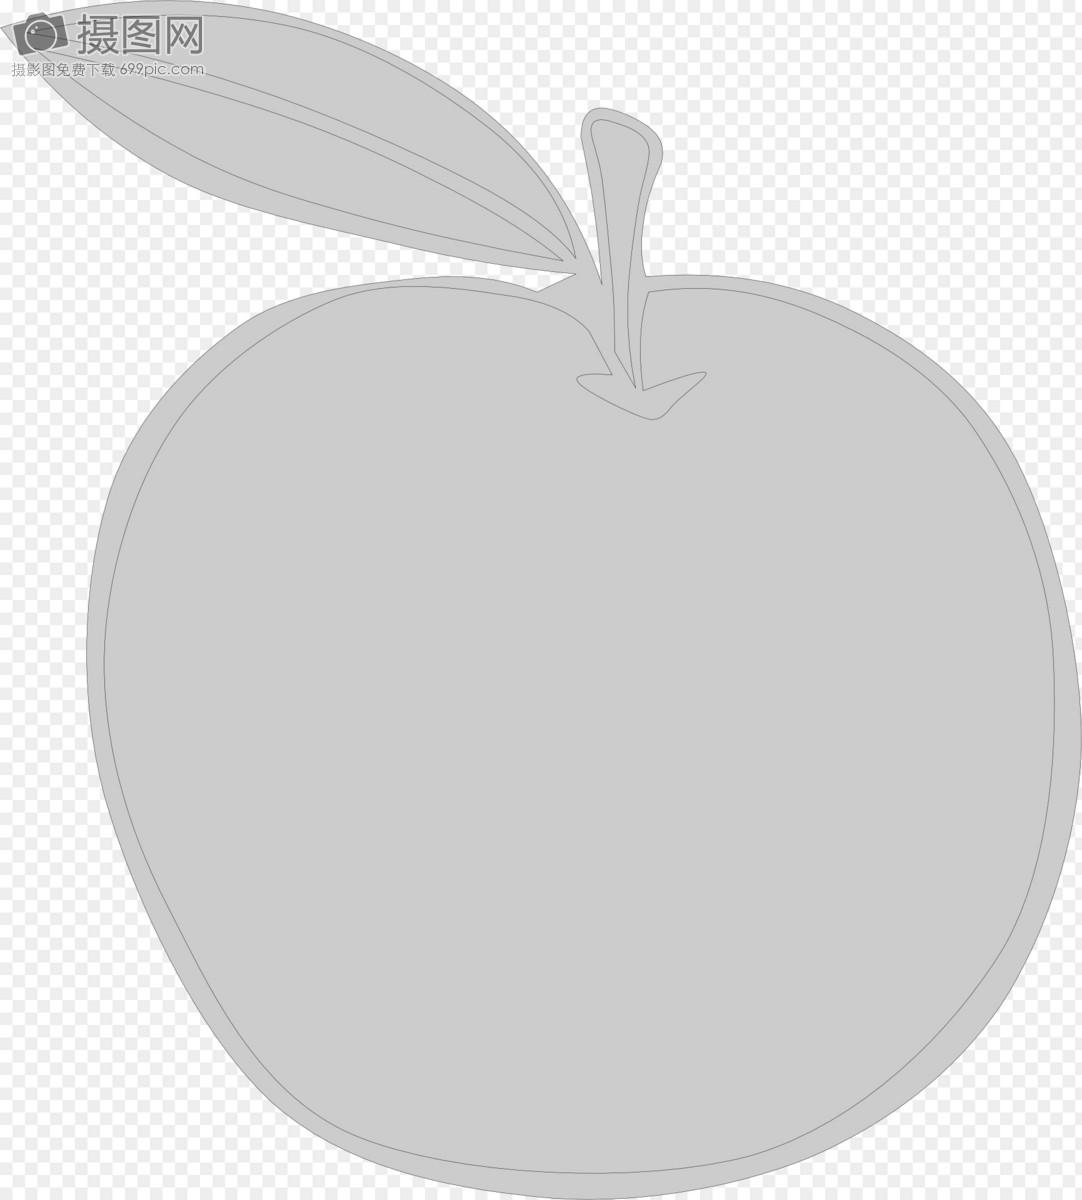 100 Gambar Apel Abu-abu Paling Bagus